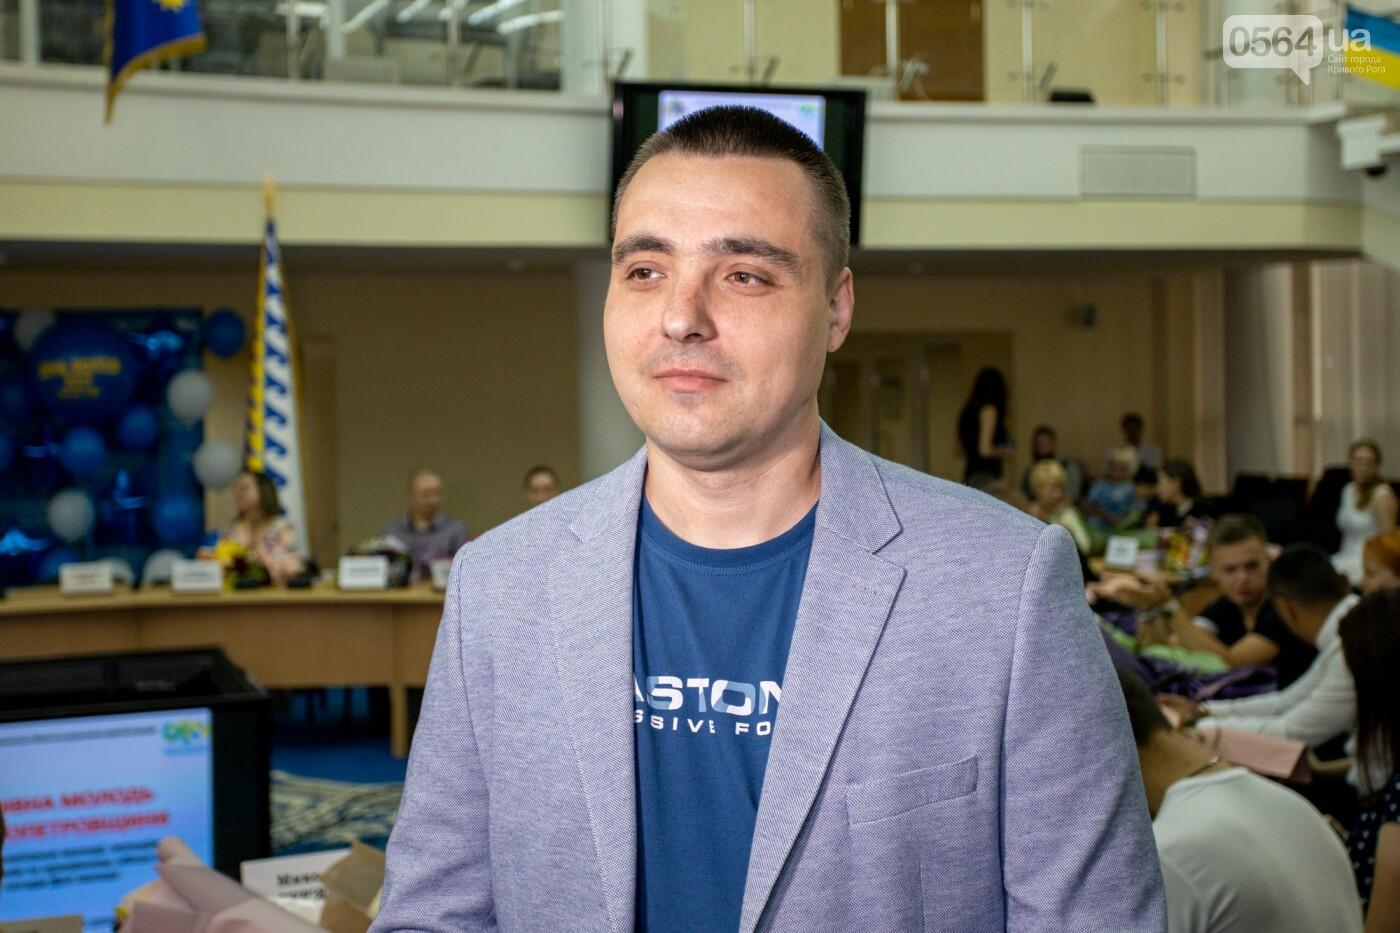 Молодым активистам Днепропетровщины вручили отличия и подарки, - ФОТО , фото-2